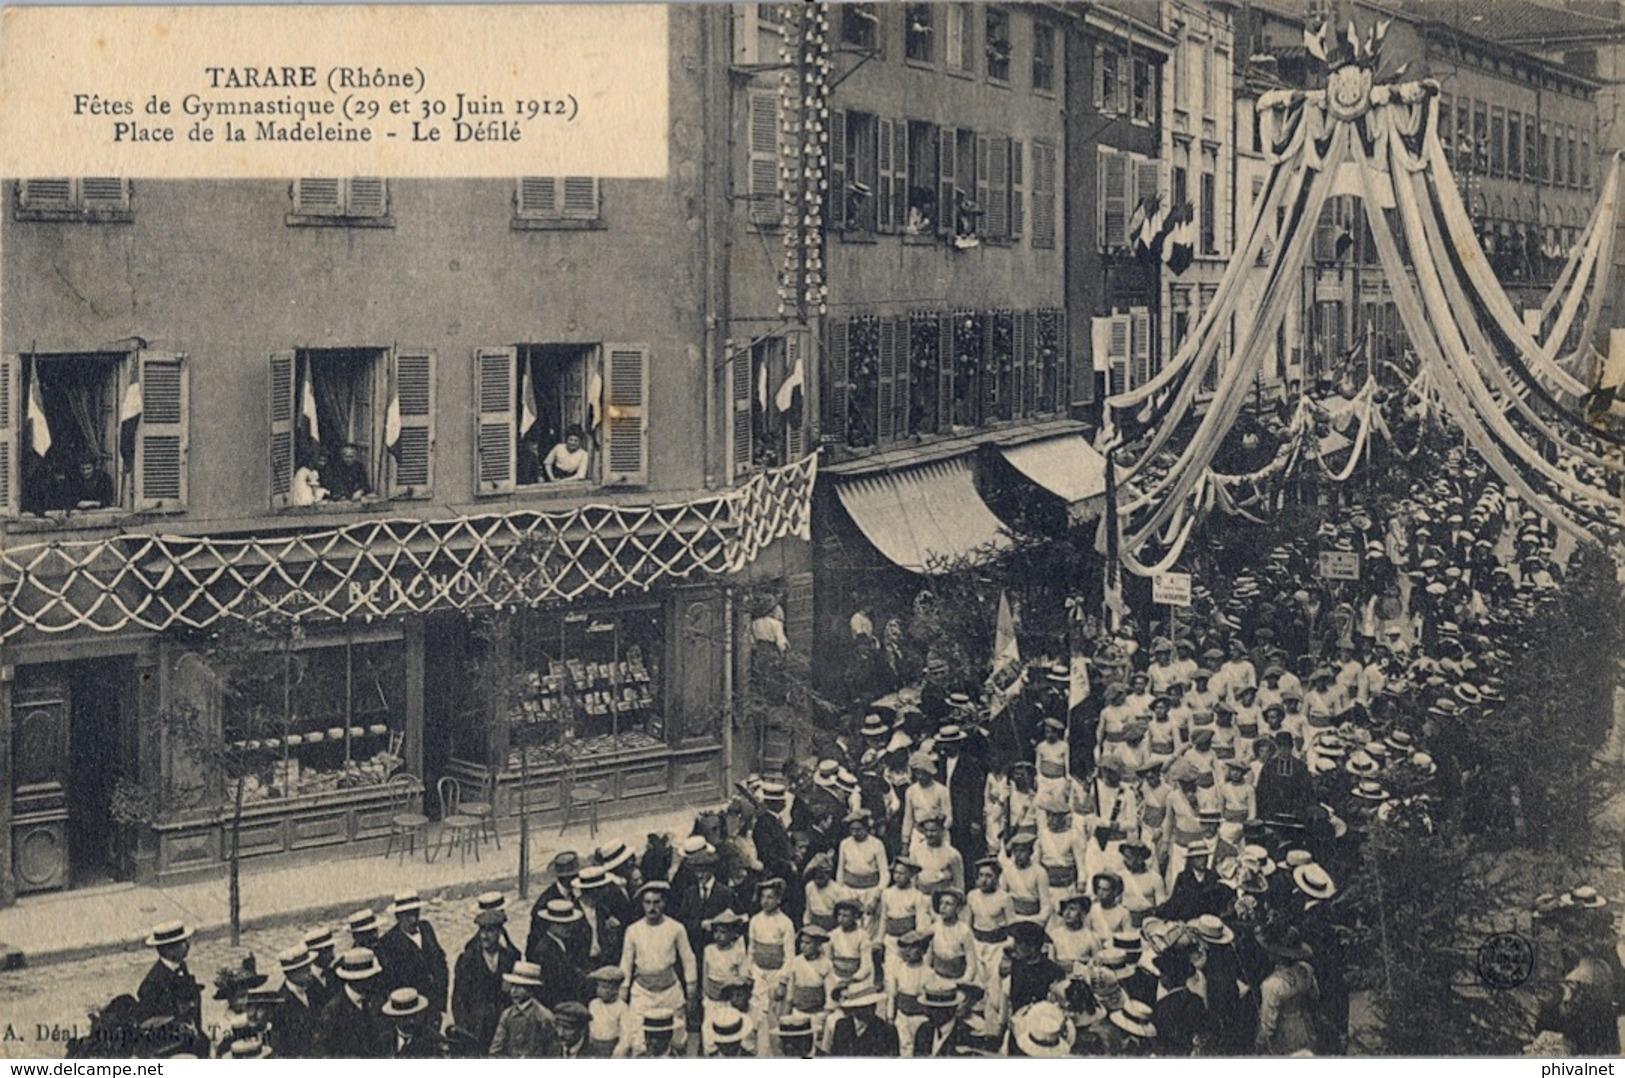 1912 FRANCIA - TARARE , T.P. SIN CIRCULAR ,  FÉTES DE GYMNASTIQUE , GIMNASIA , LA MADELEINE , LE DÉFILÉ - Gimnasia